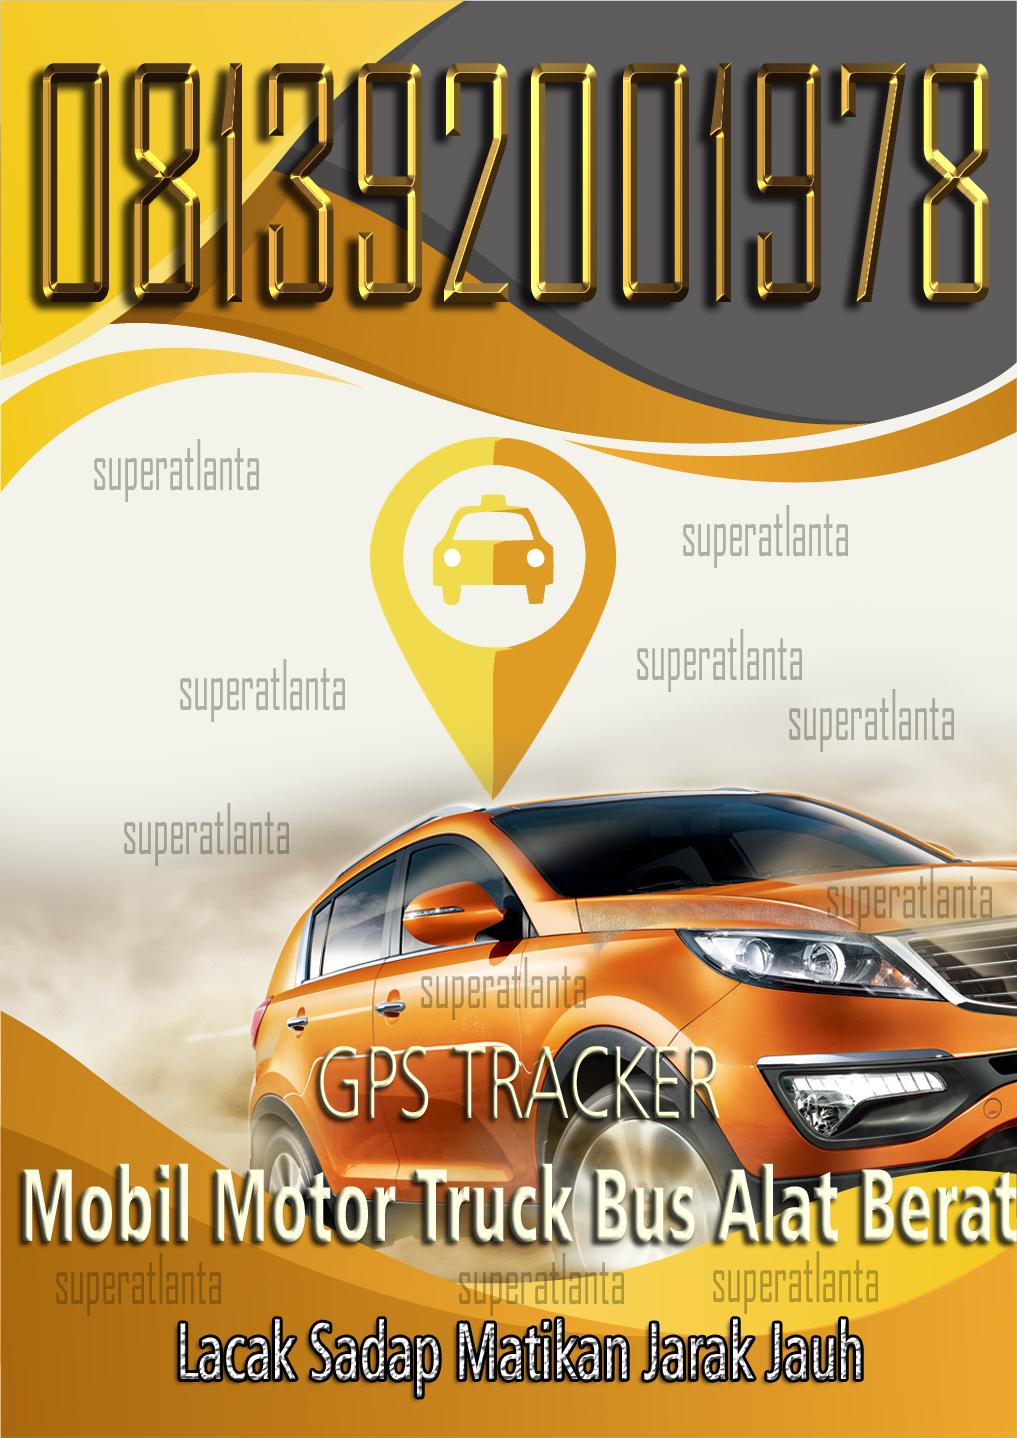 harga gps tracker mojokerto pasang murah untuk mobil motor truk bus alat berat